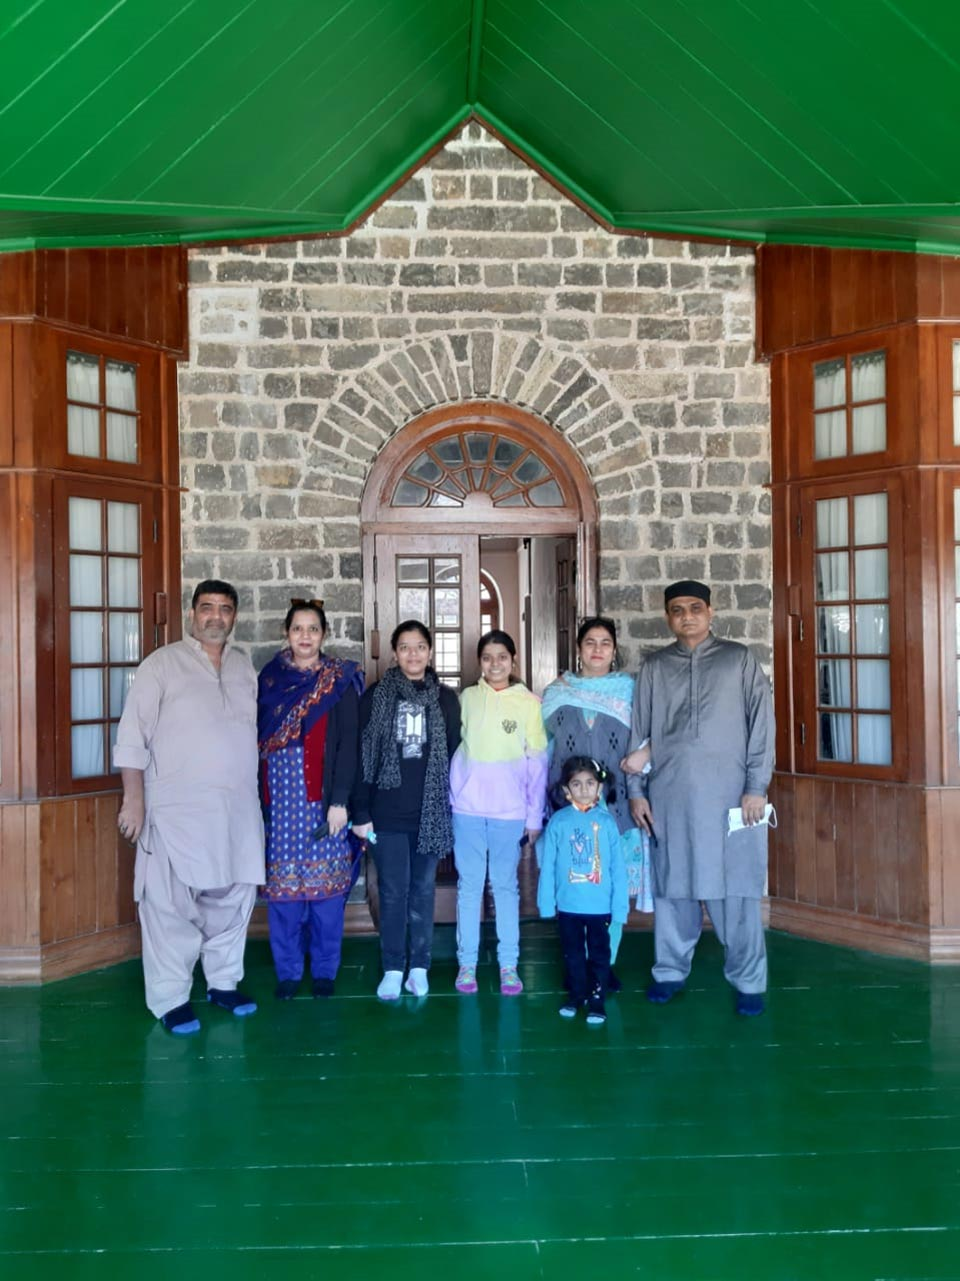 Imran, Erum, Zoya, Zara, Farhat, Ayesha and Adnan at the entrance of the residency.